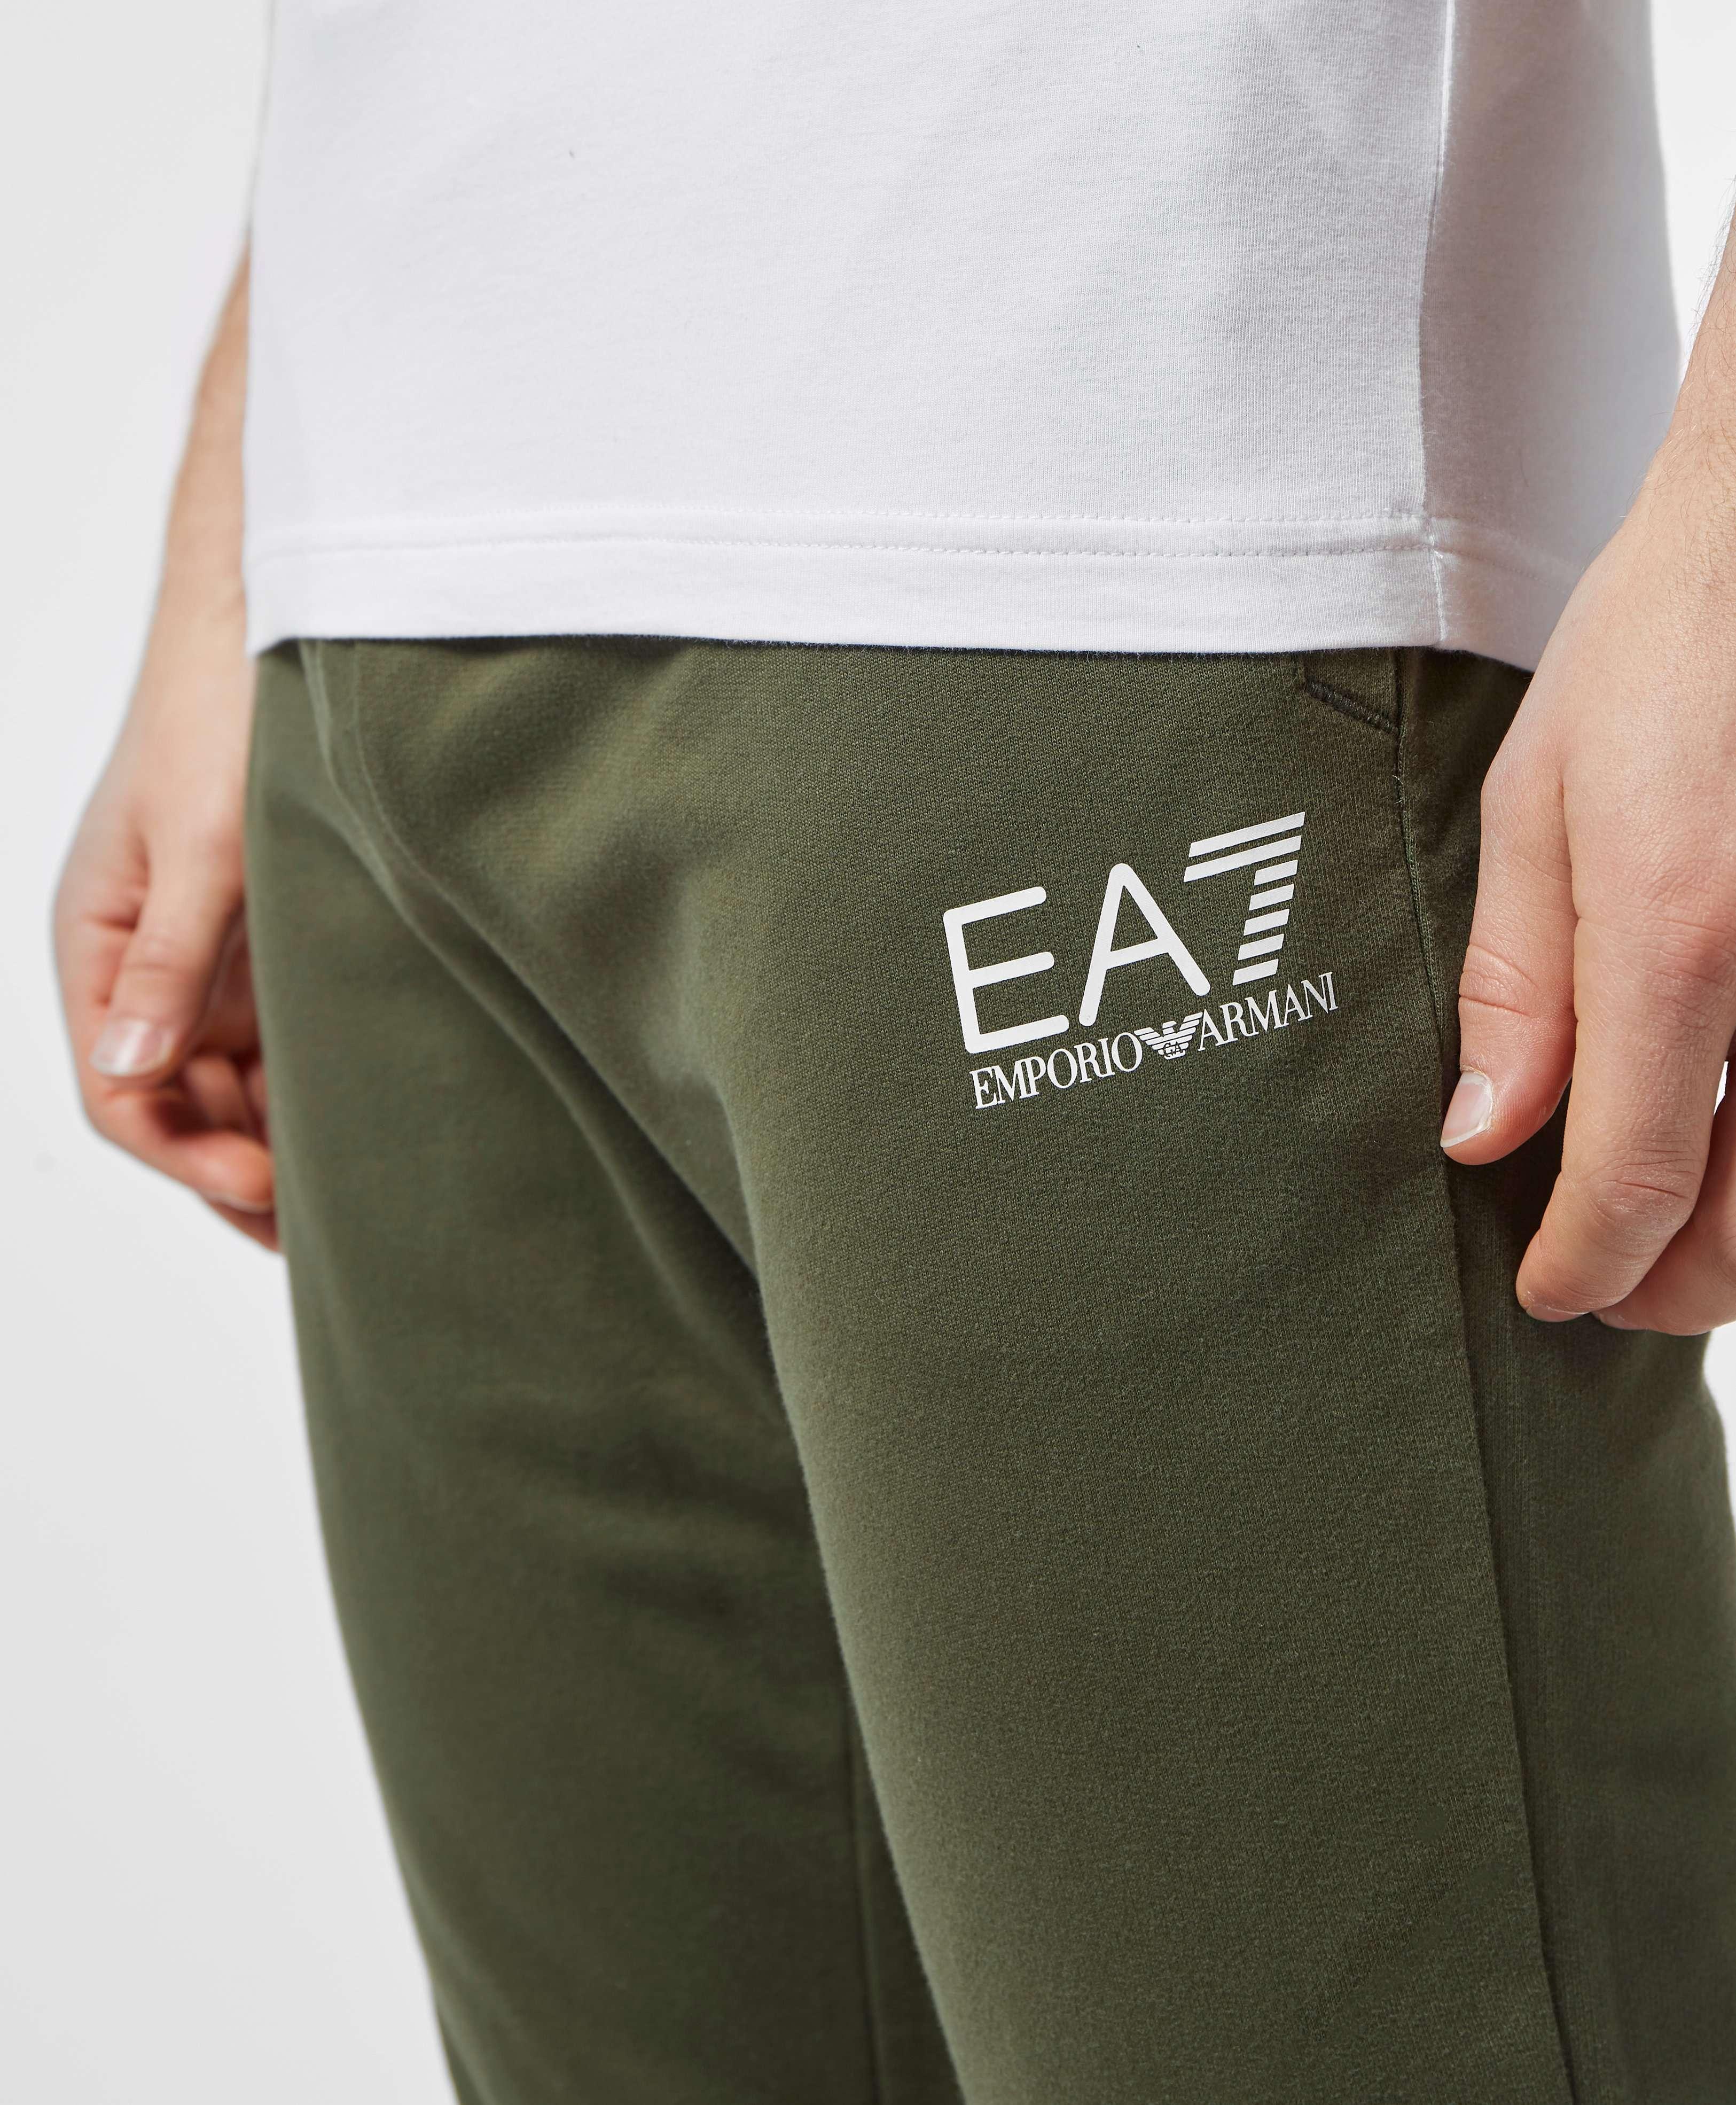 Emporio Armani EA7 Eagle Cuffed Fleece Pants - Exclusive